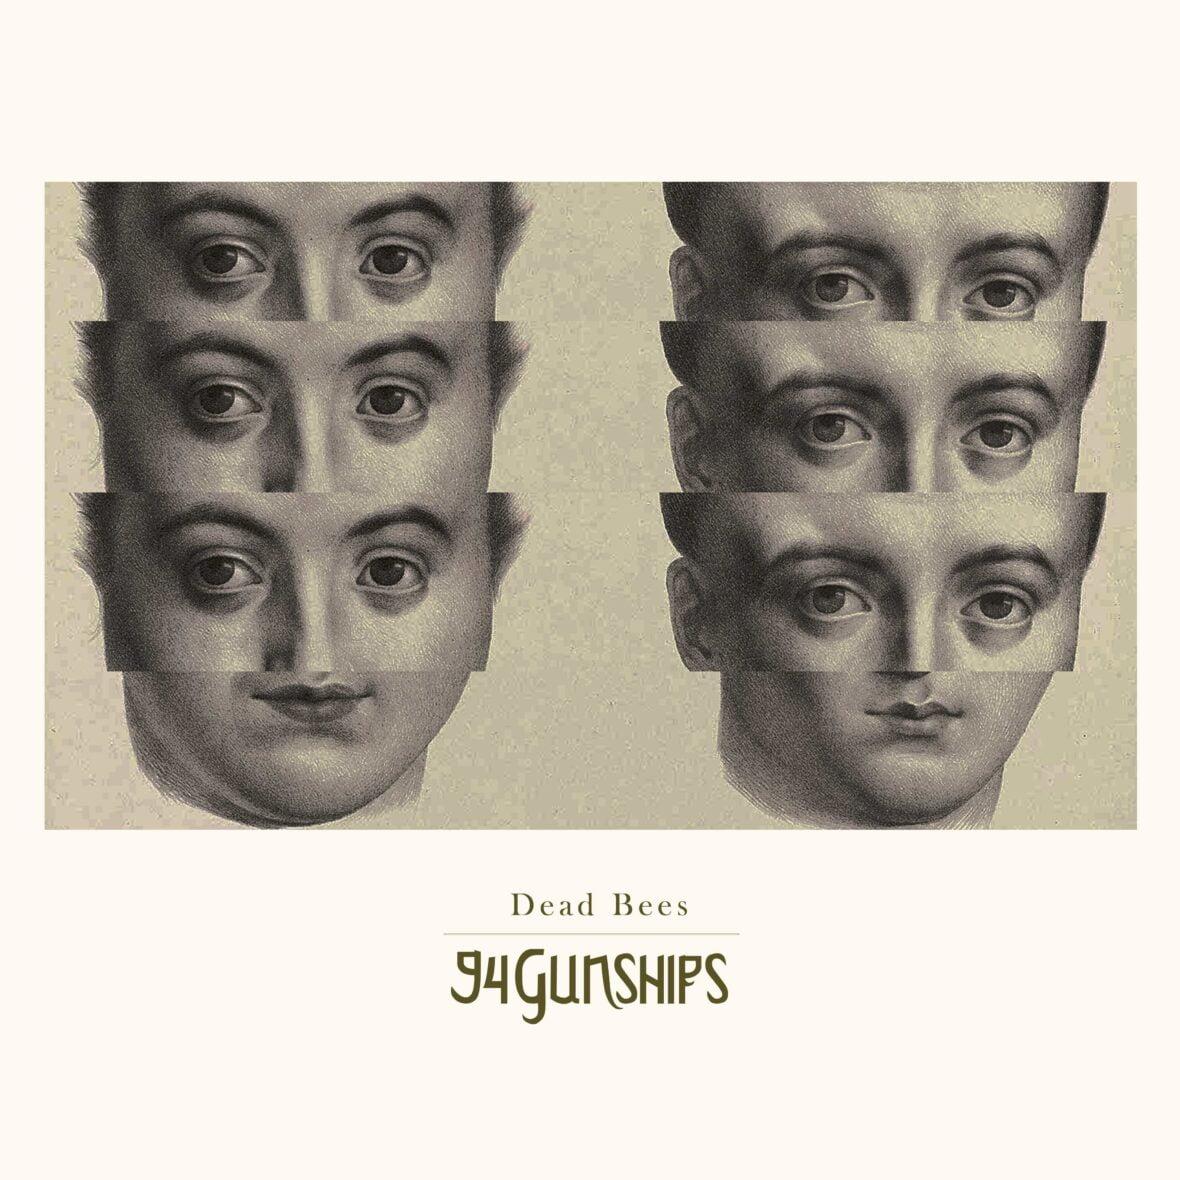 94 Gunships - Dead Bees EP